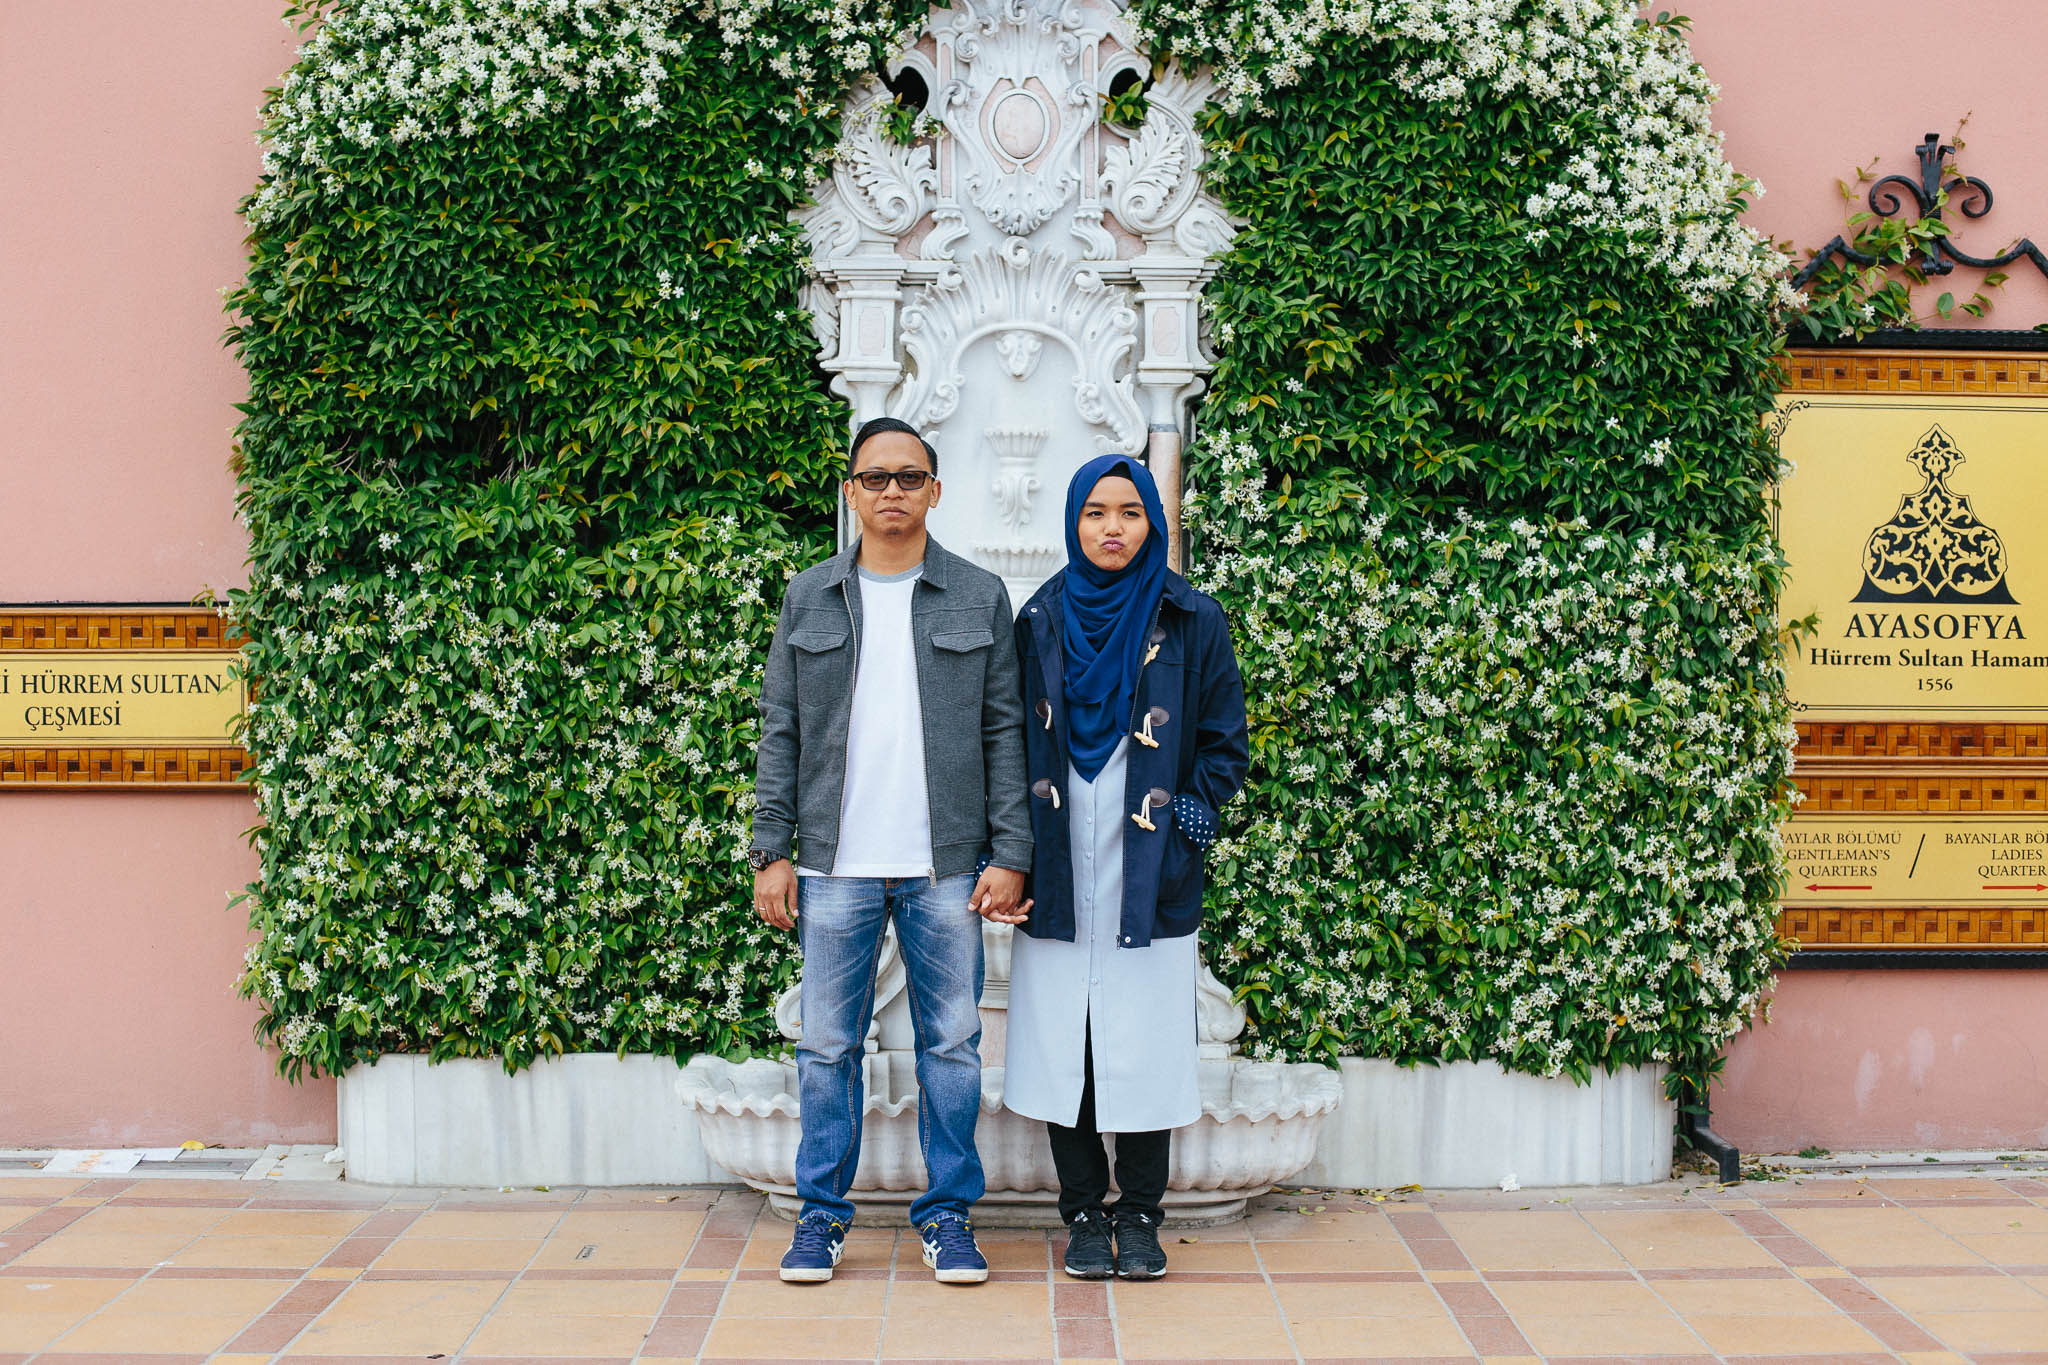 singapore-wedding-photographer-dzul-isma-istanbul-21.jpg